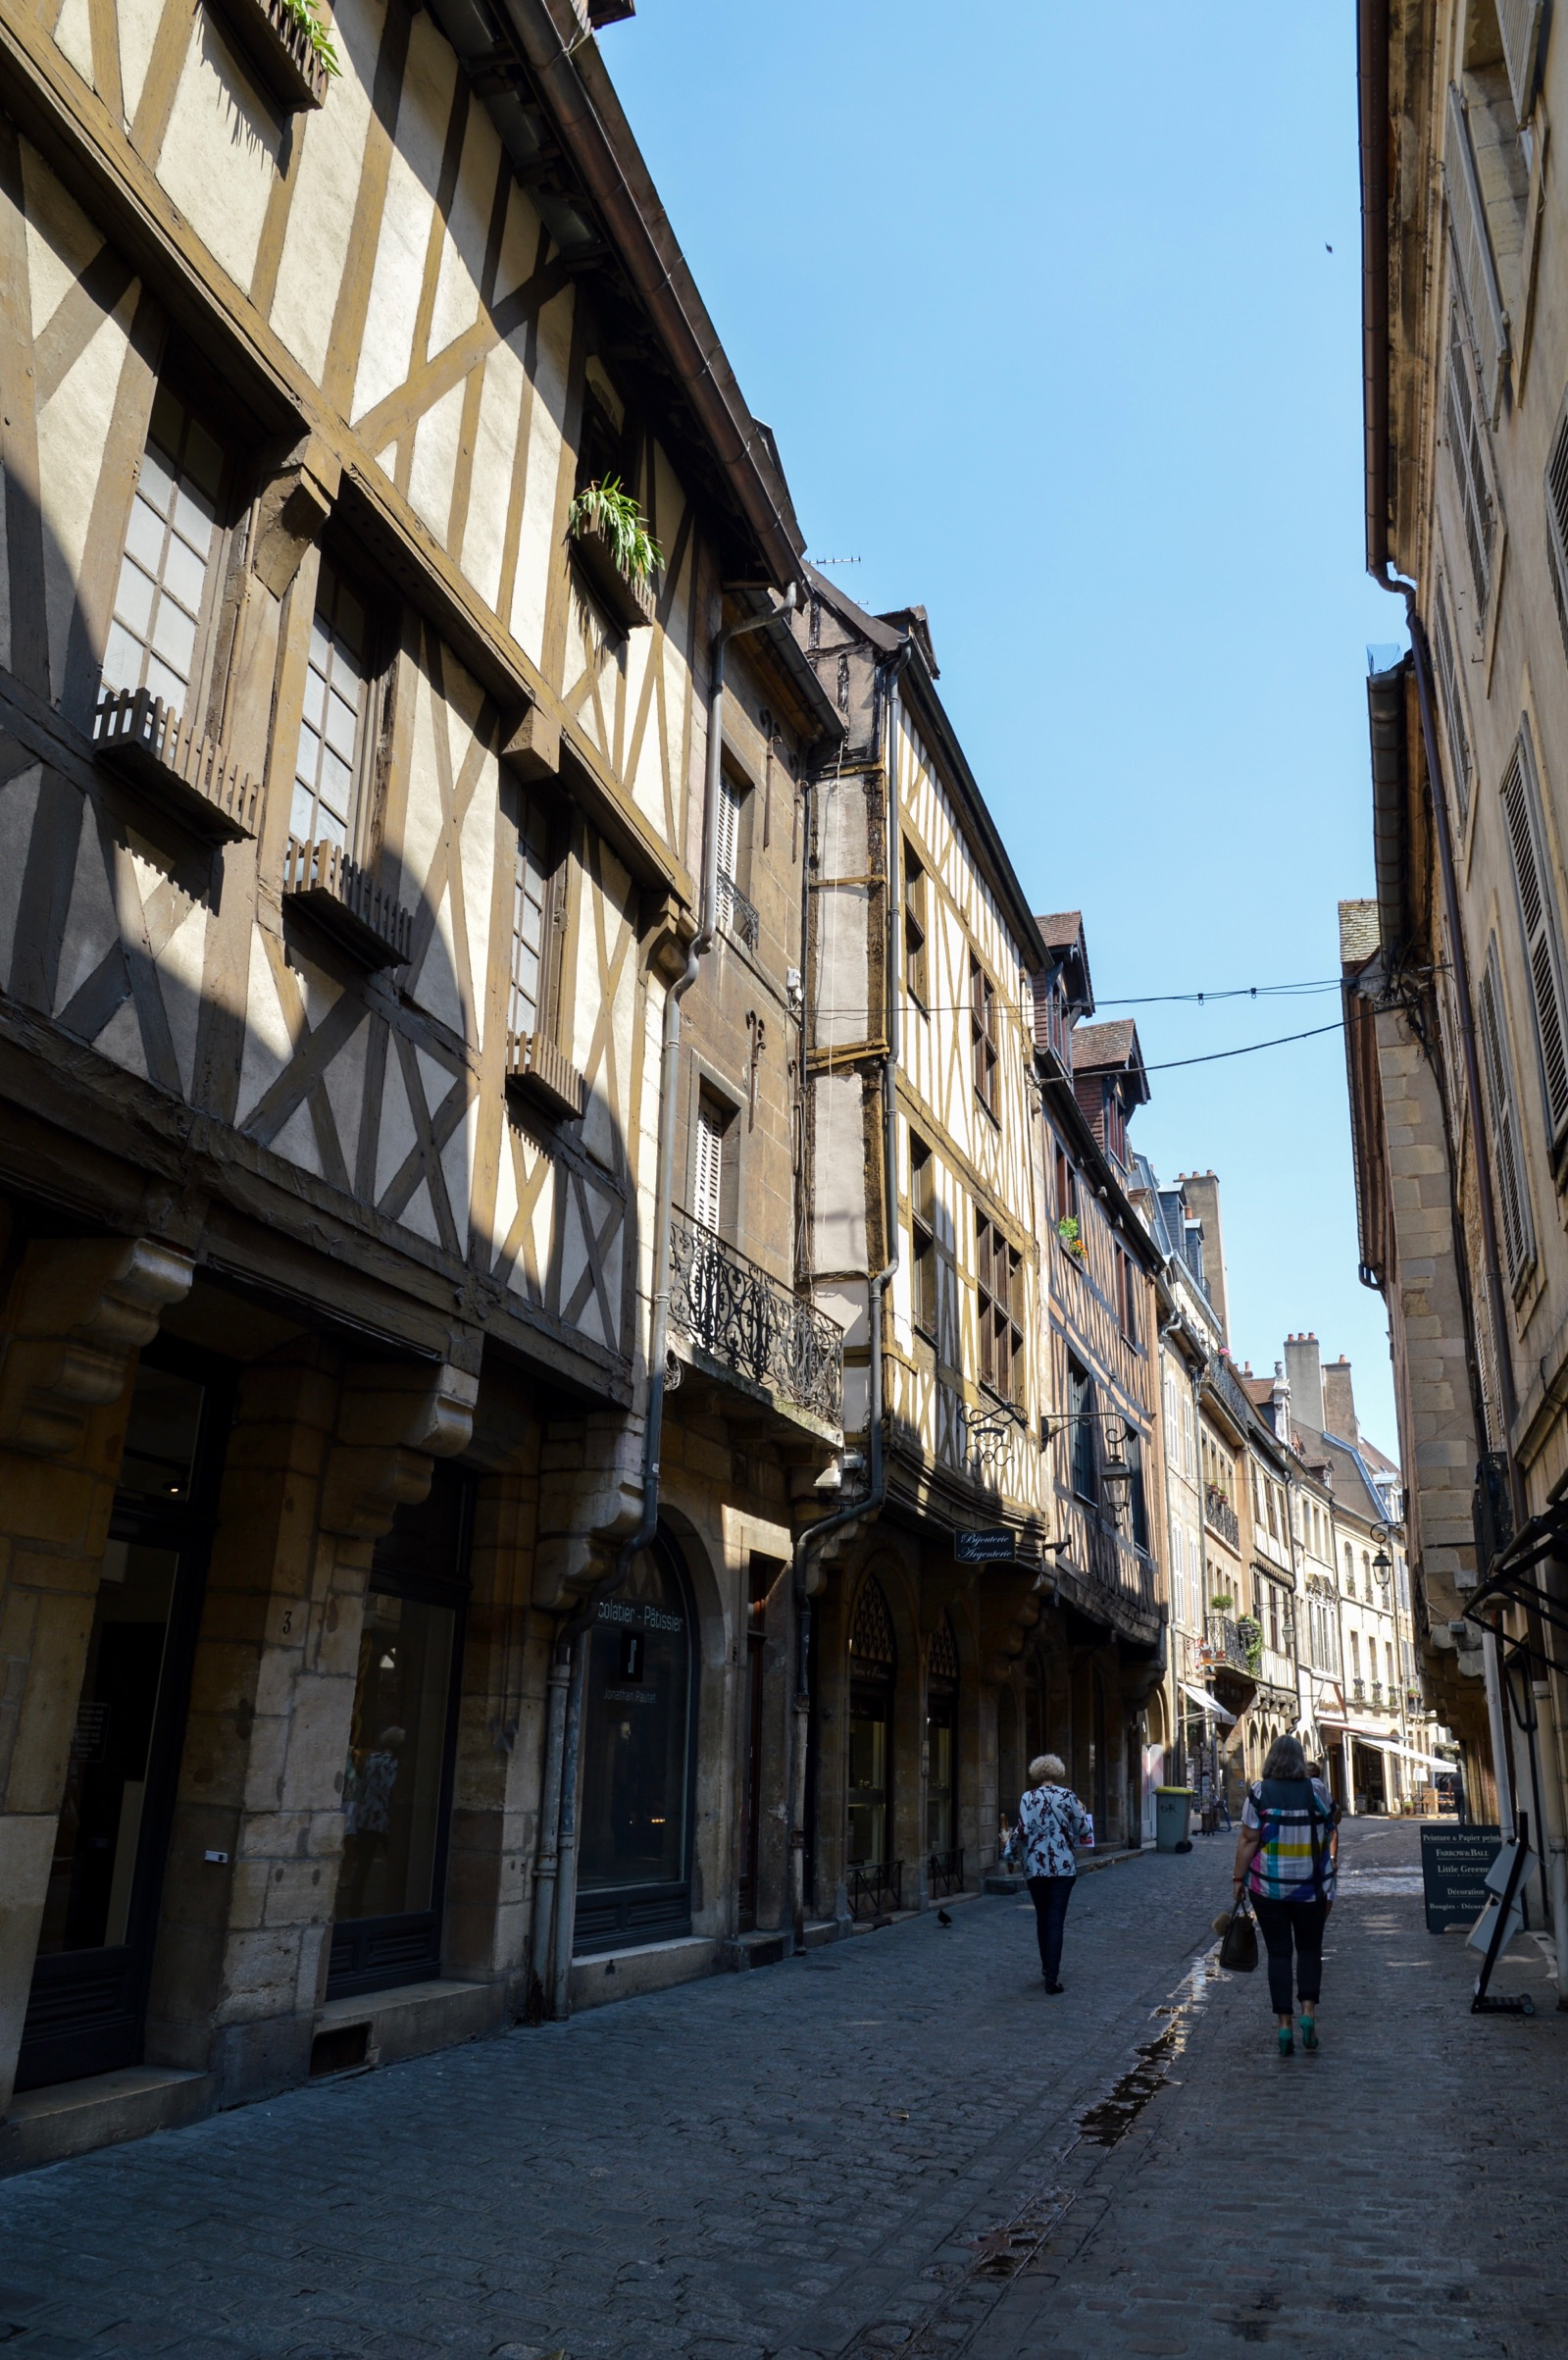 Medieval half-timbered houses, Dijon, France